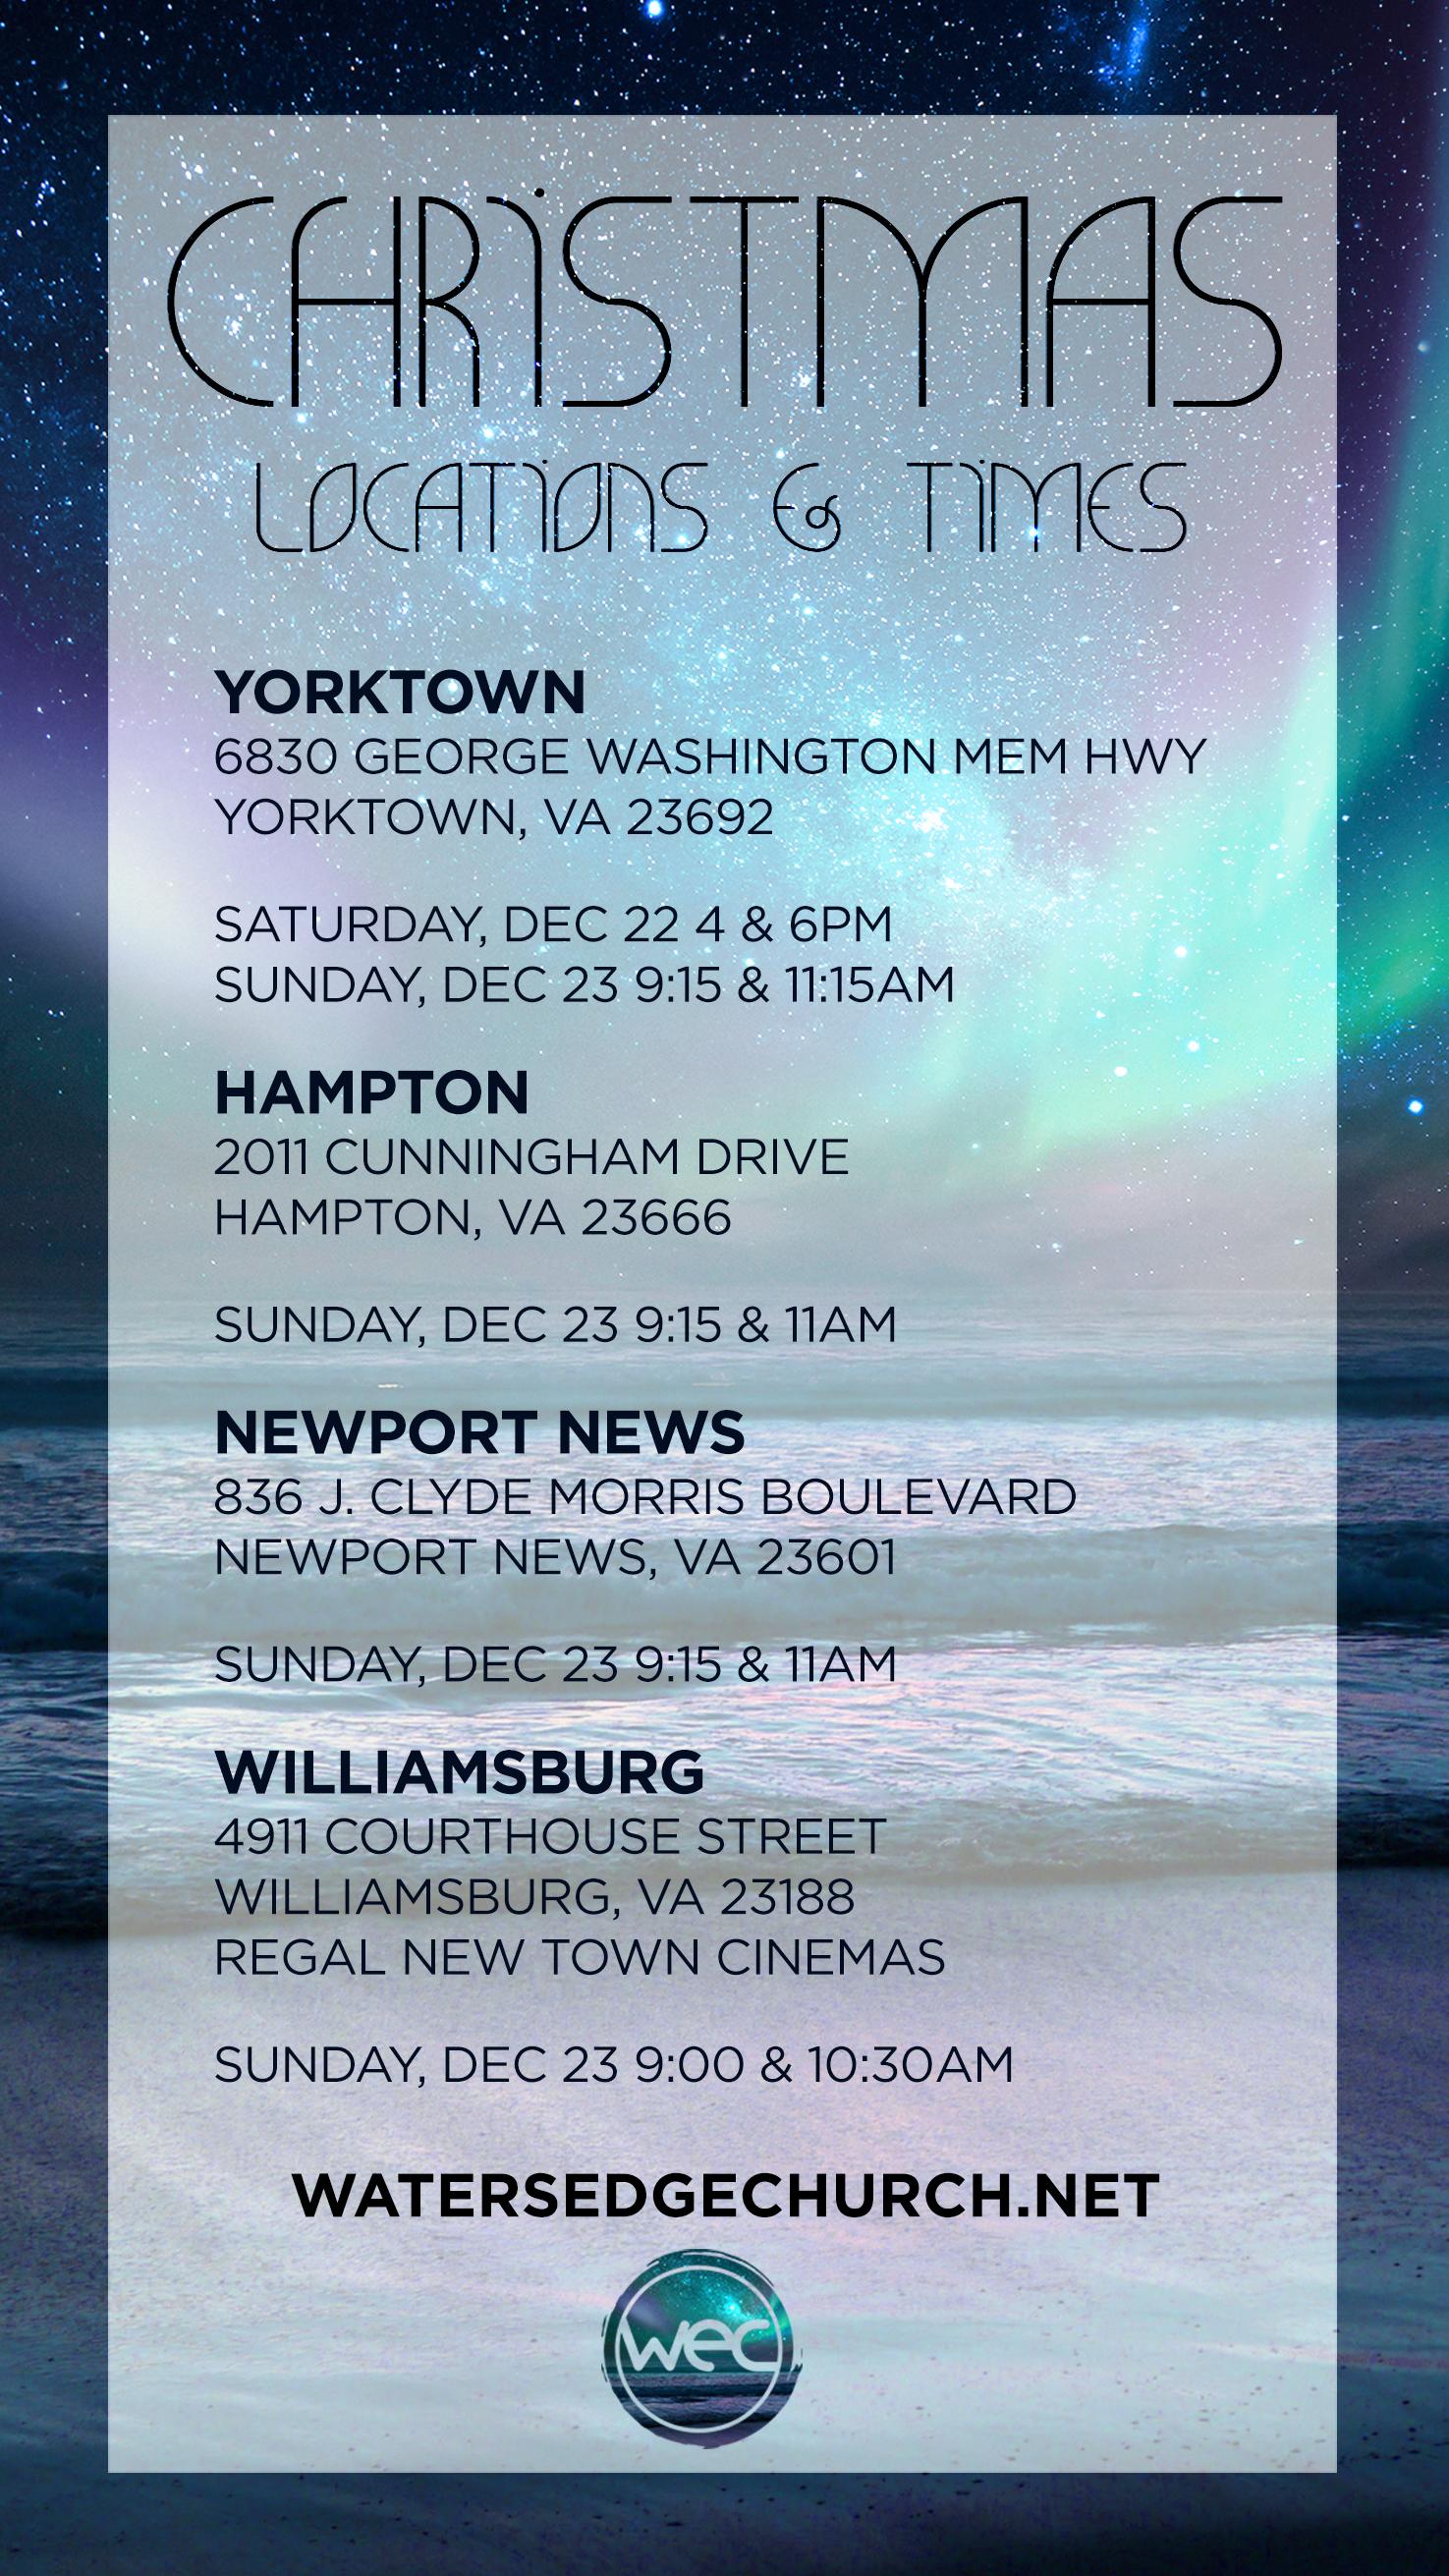 Christmas-Locations-1080x1920.jpg